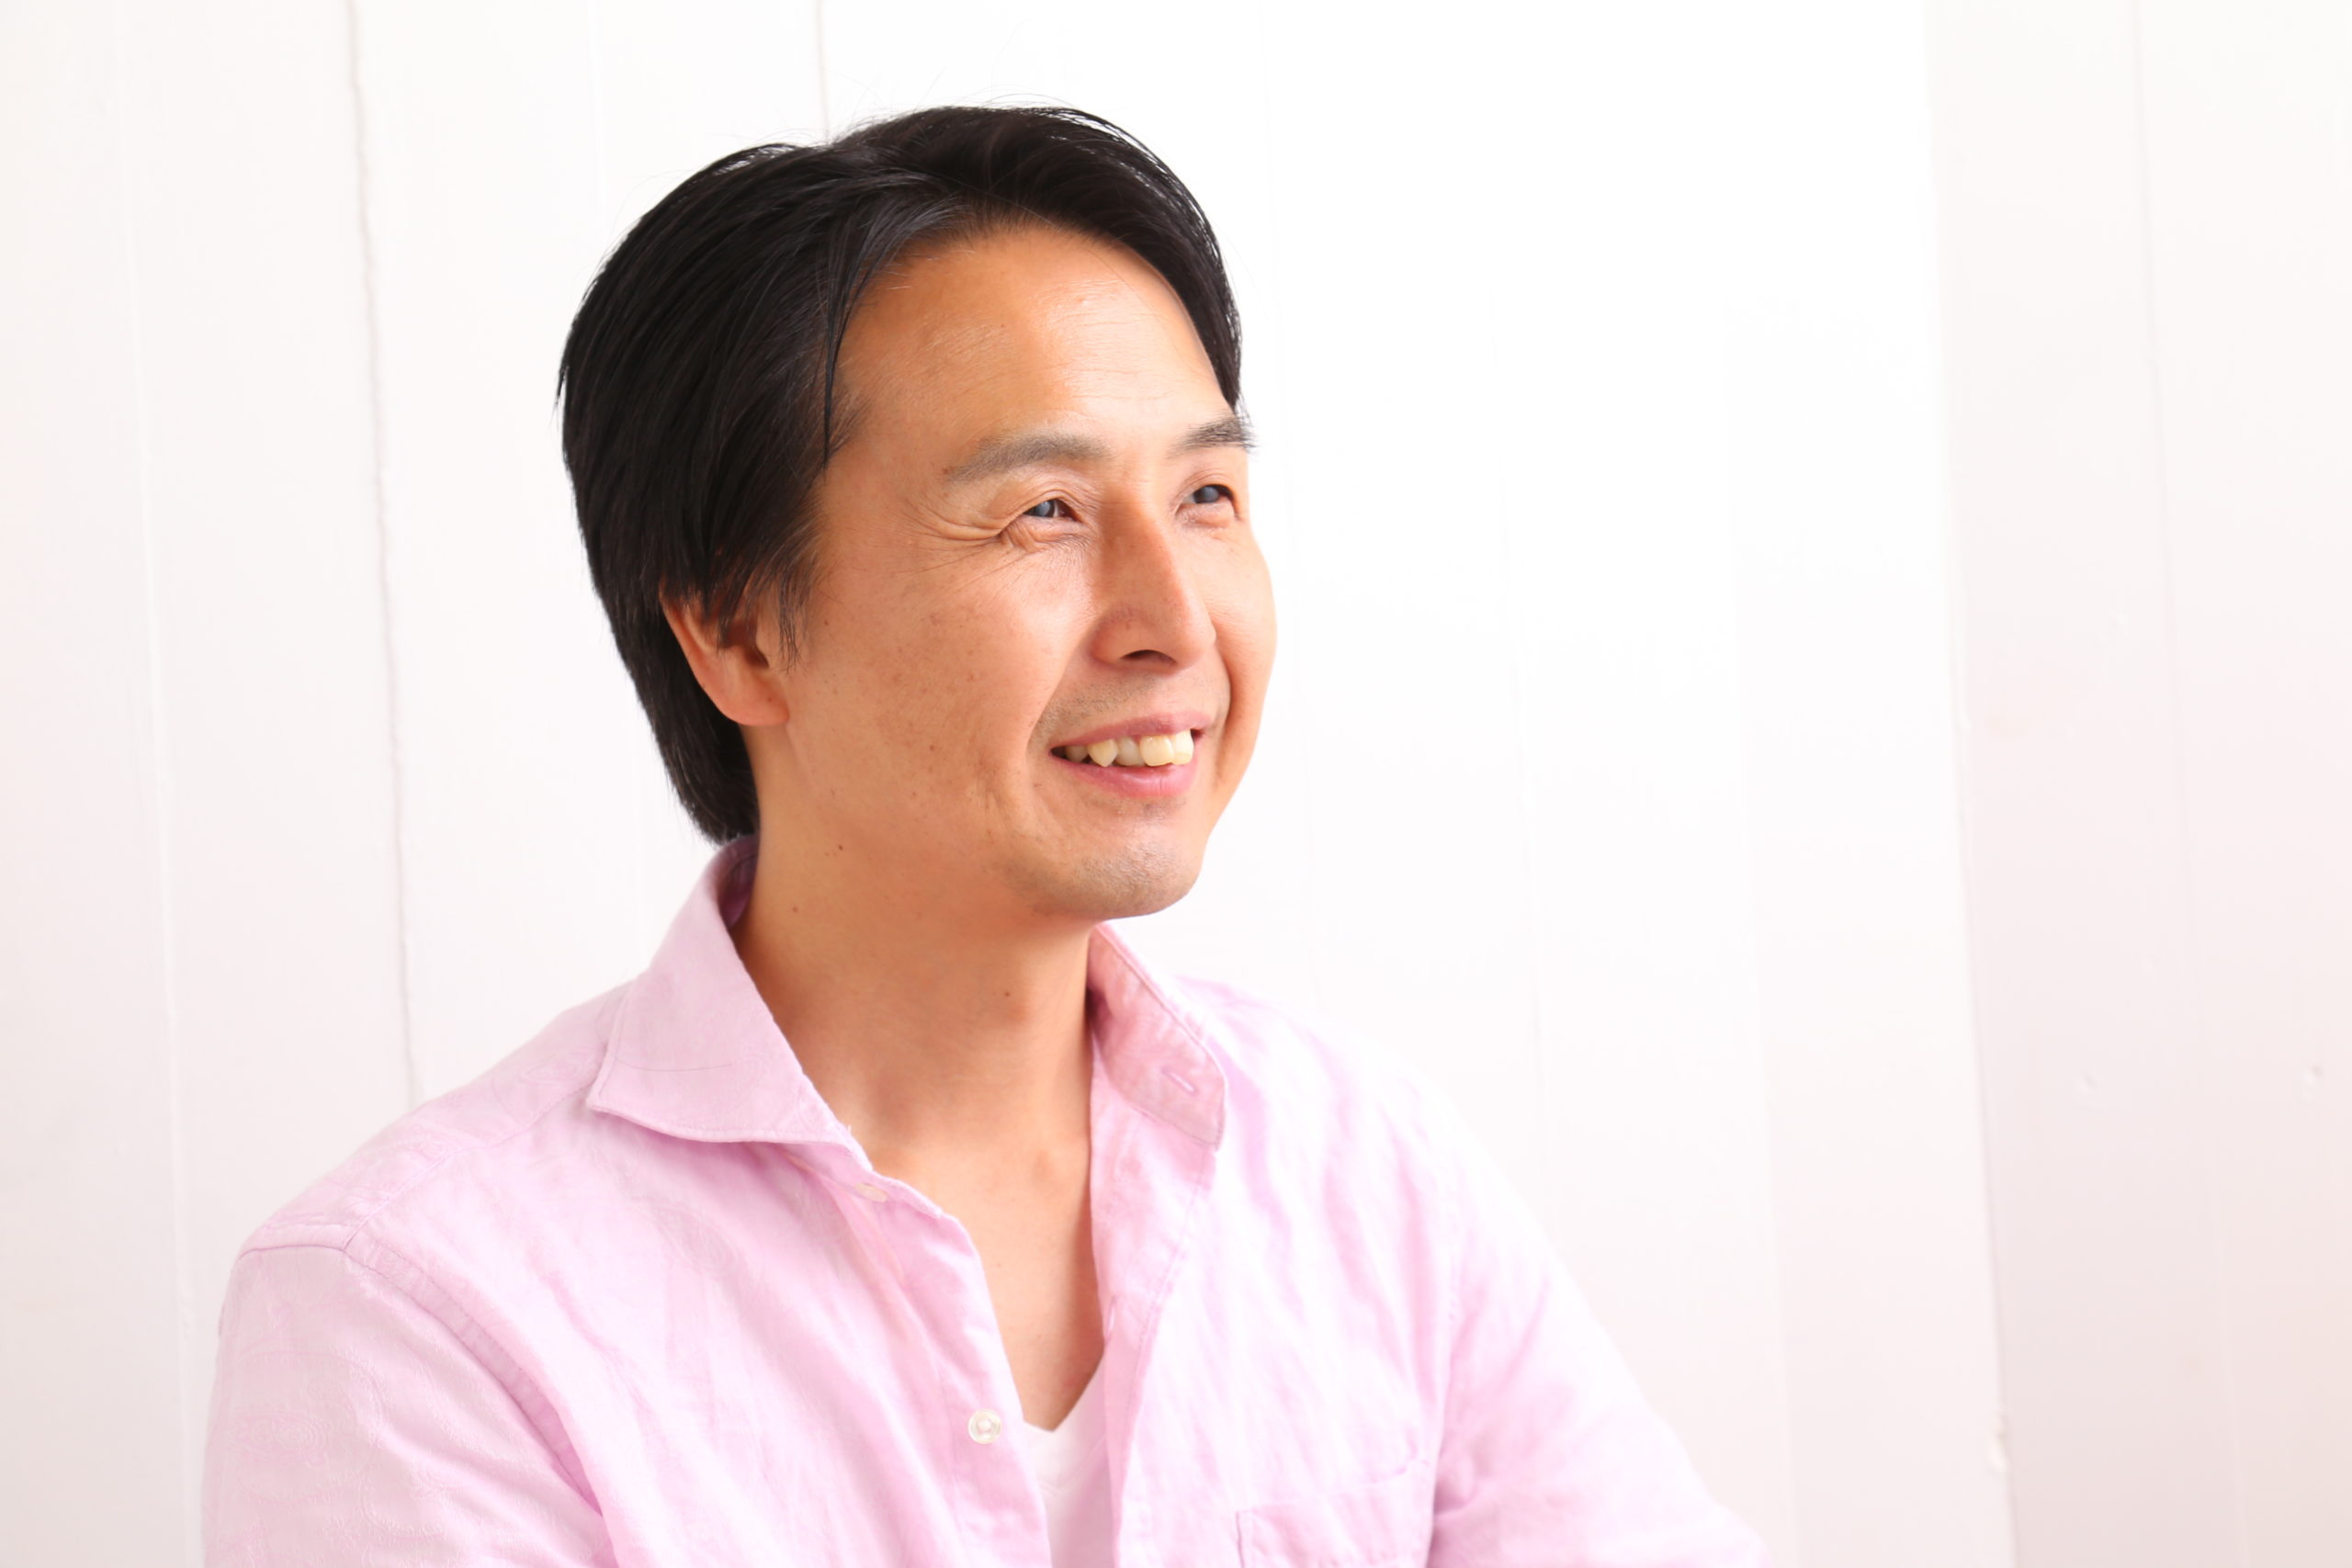 井上創 Hajime Inoue